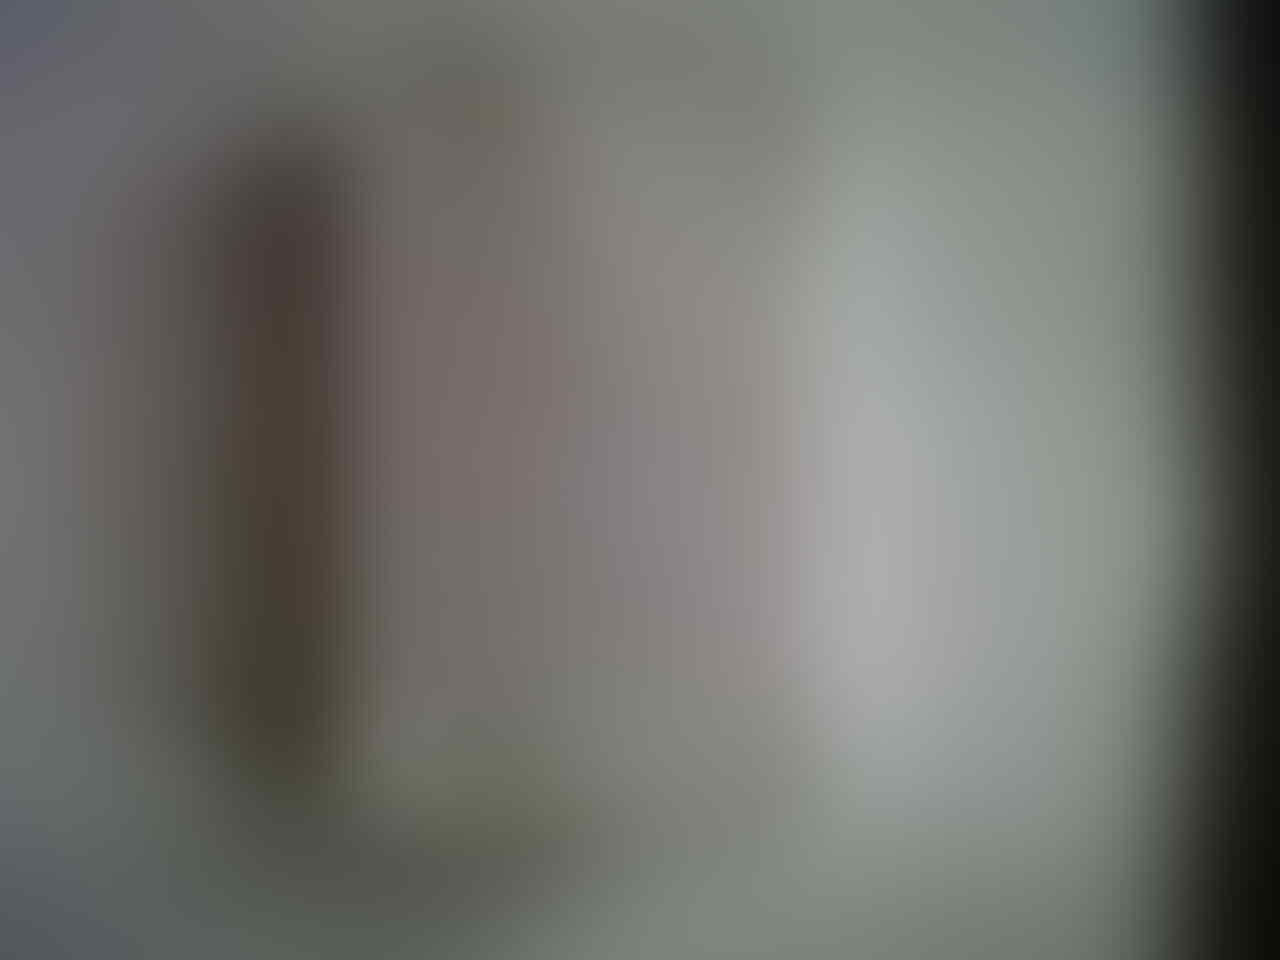 WTB Ipod 4th gen 8GB white Bandung